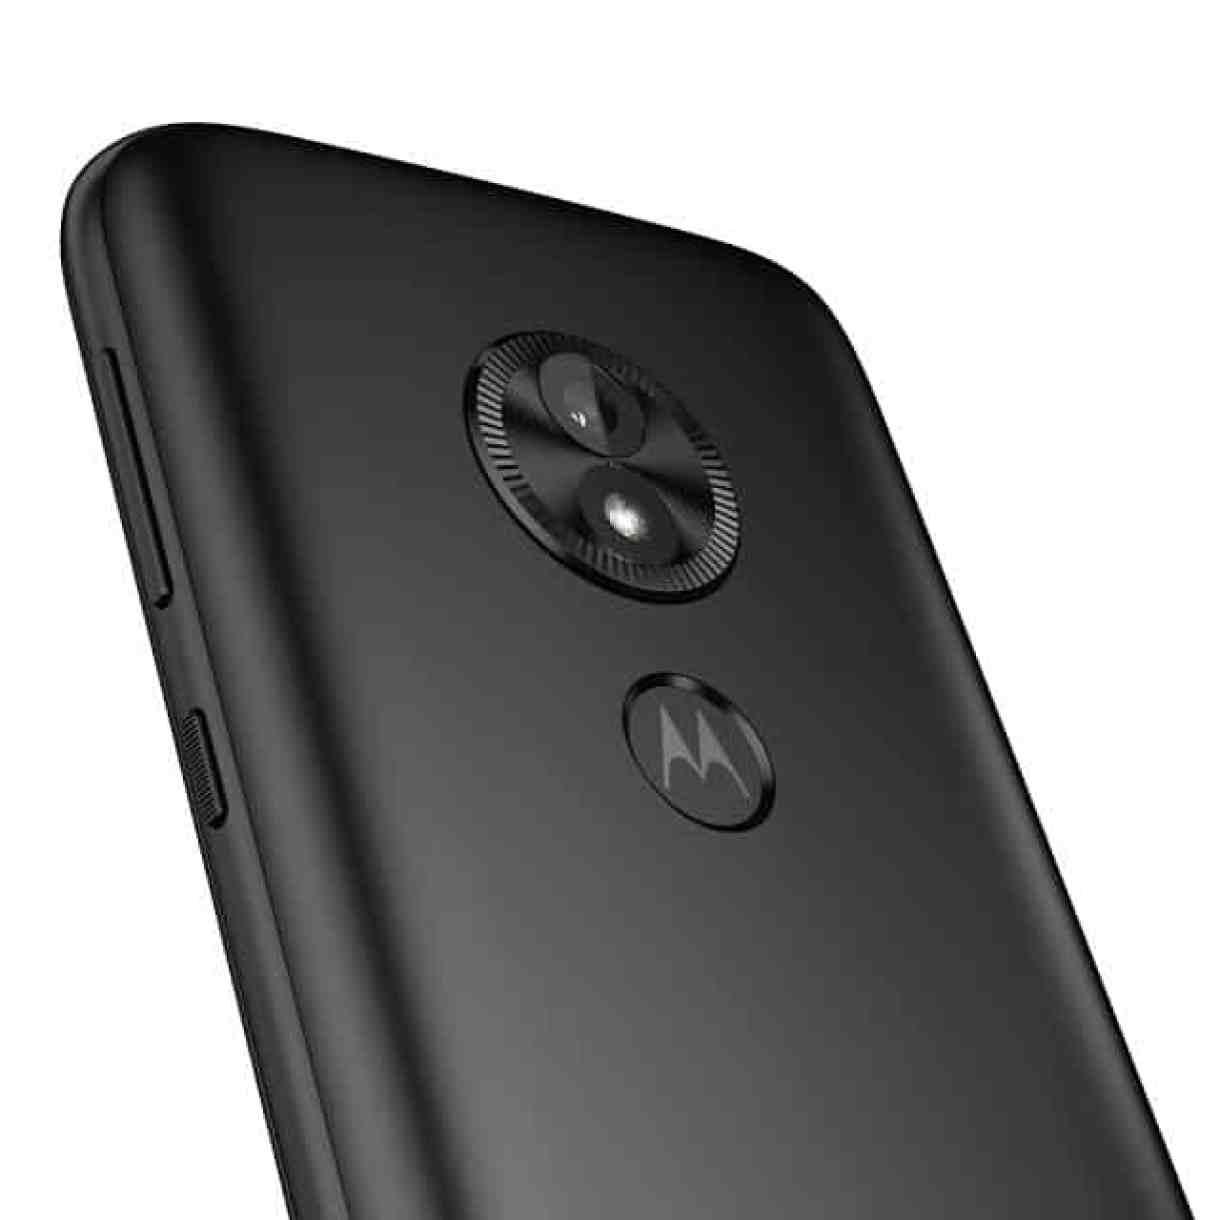 - MotoE5Play ROW Black CAMERADETAIL 1 - moto e5 play โทรศัพท์มือถือ Android Go จอใหญ่ มีสแกนลายนิ้วมือ ในราคาเพียง 2,888 บาท